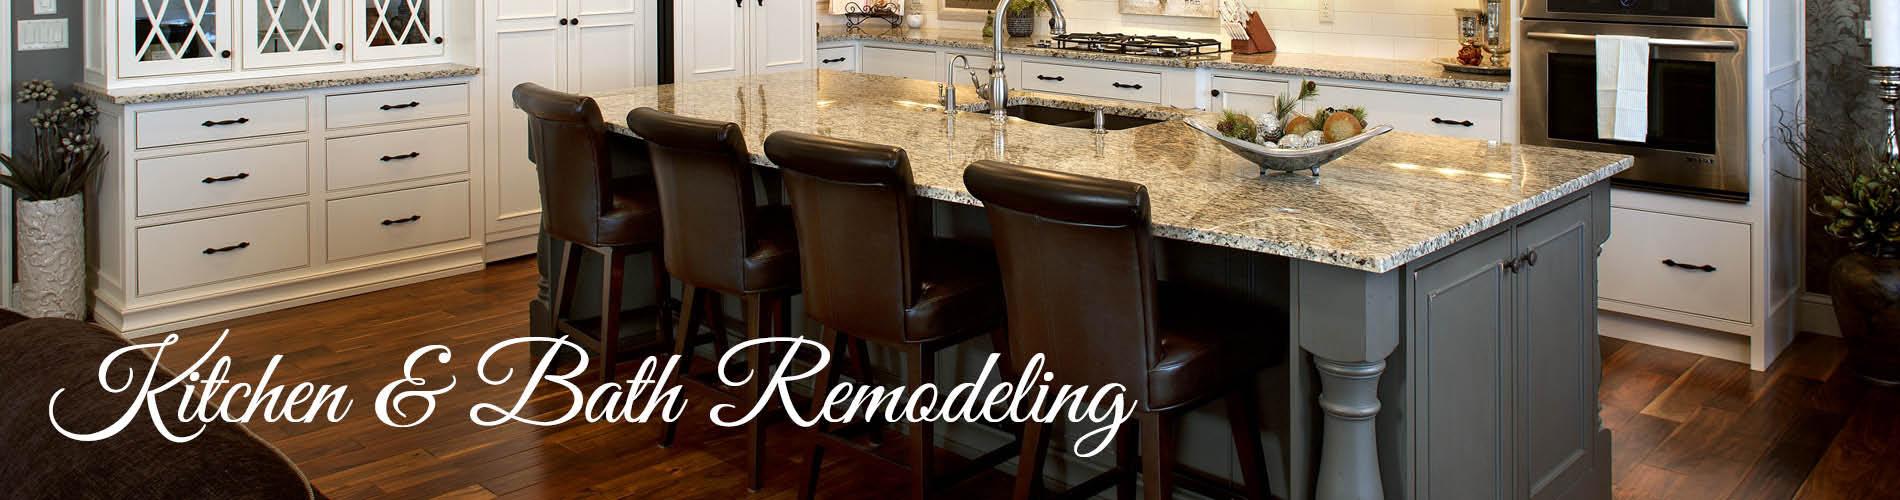 La Carpet Kitchen And Bath Remodeling